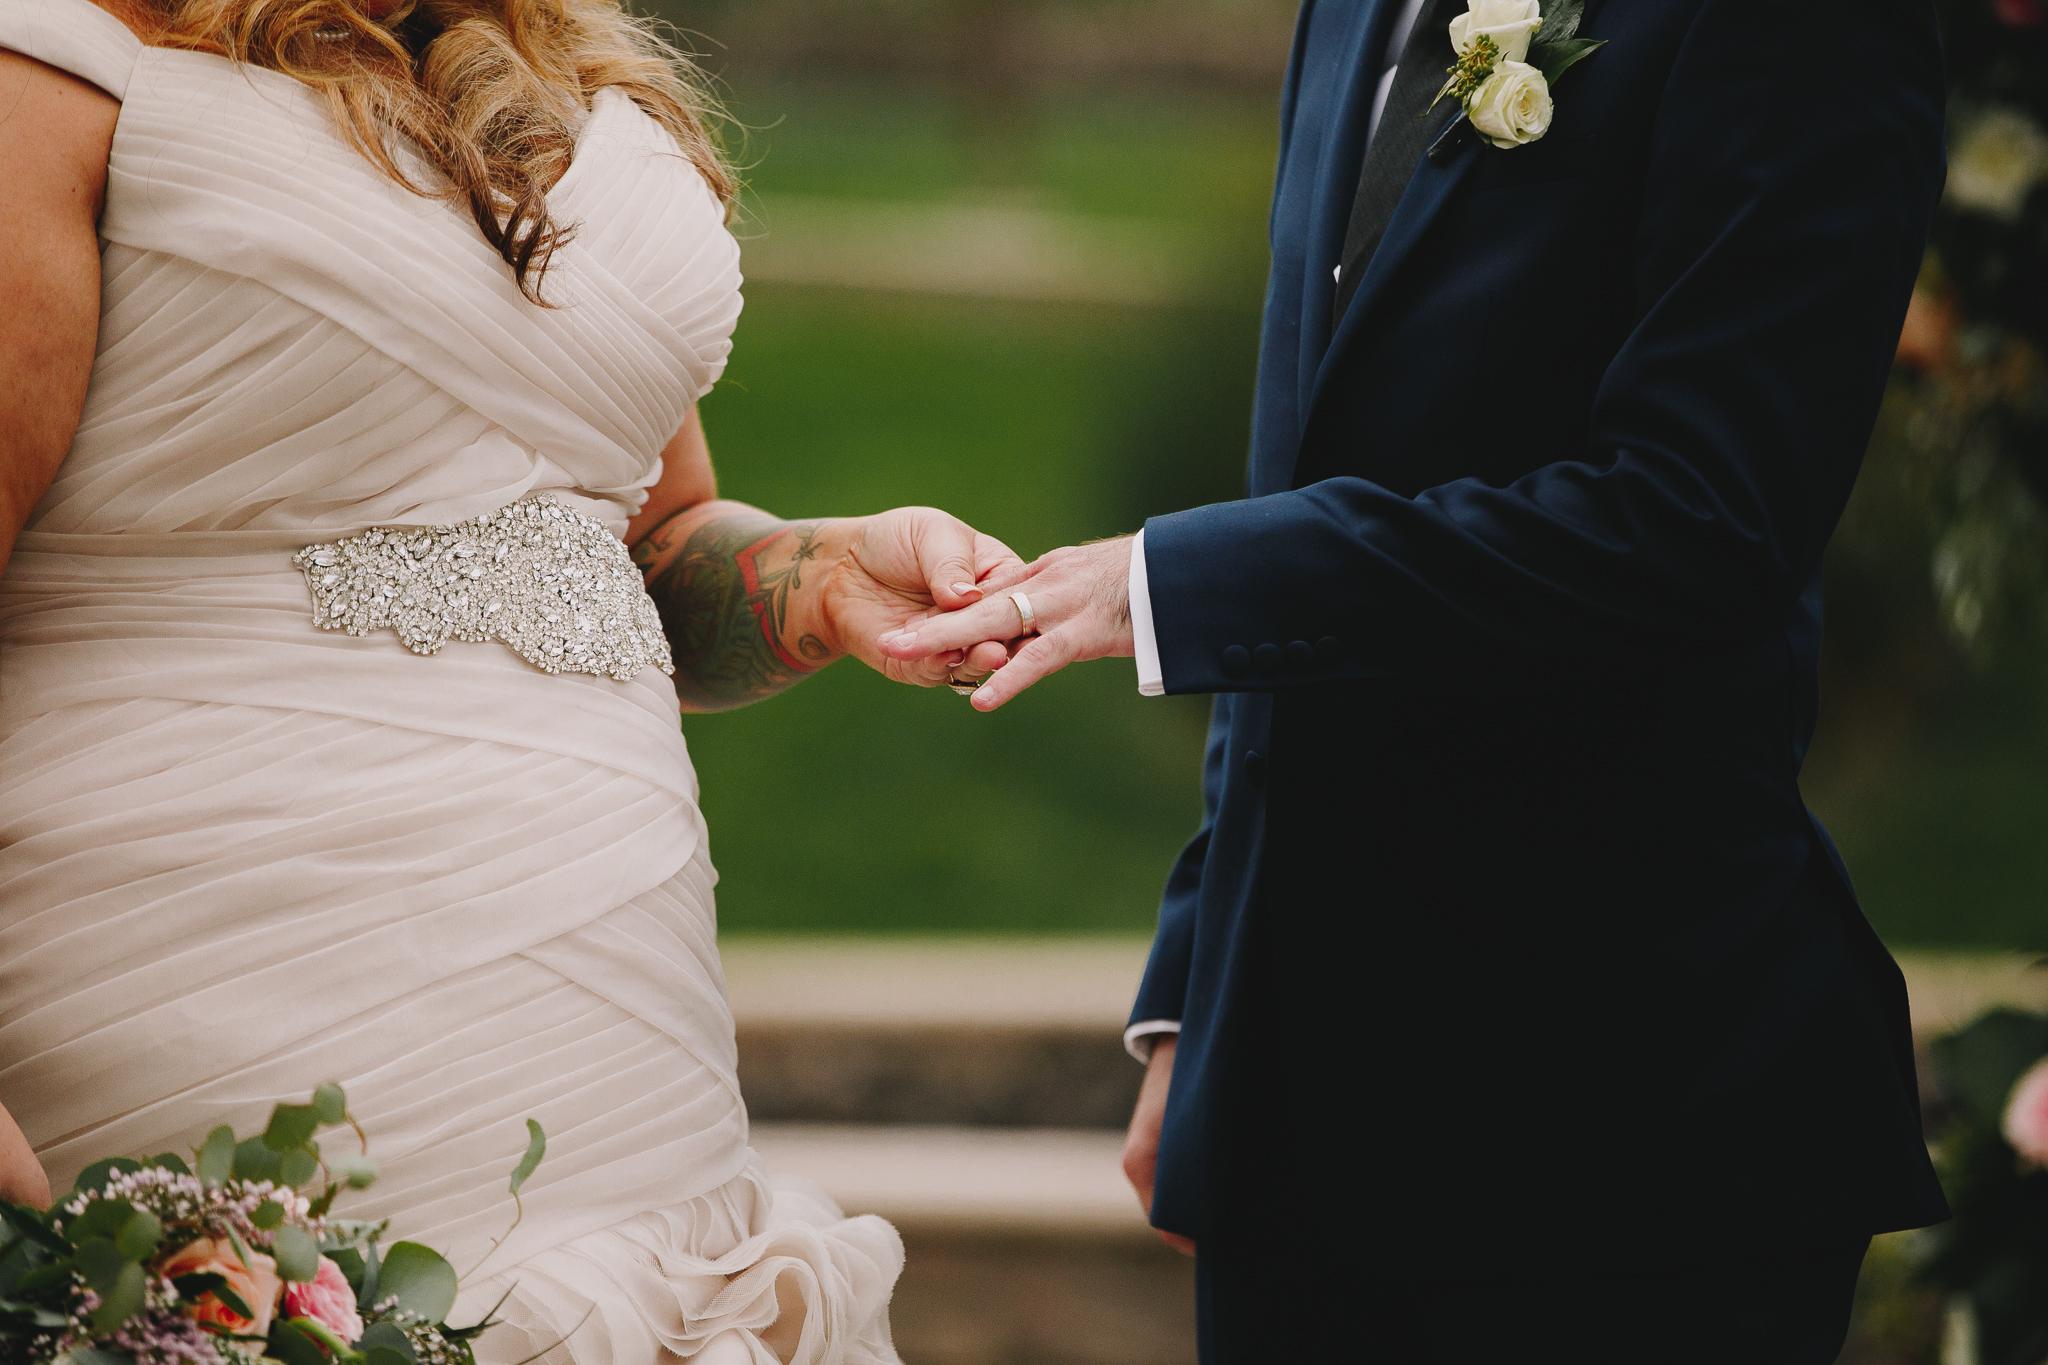 Archer_Inspired_Photography_Ritz_Carlton_Half_Moon_Bay_Wedding-120.jpg